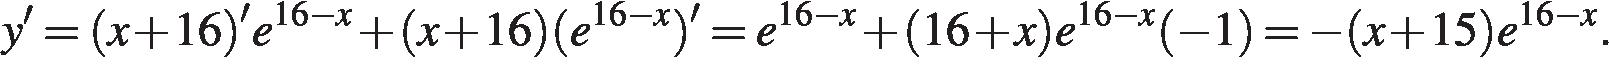 http://reshuege.ru/formula/20/209b2eb1e098281c61e2062ace6a93f1p.png